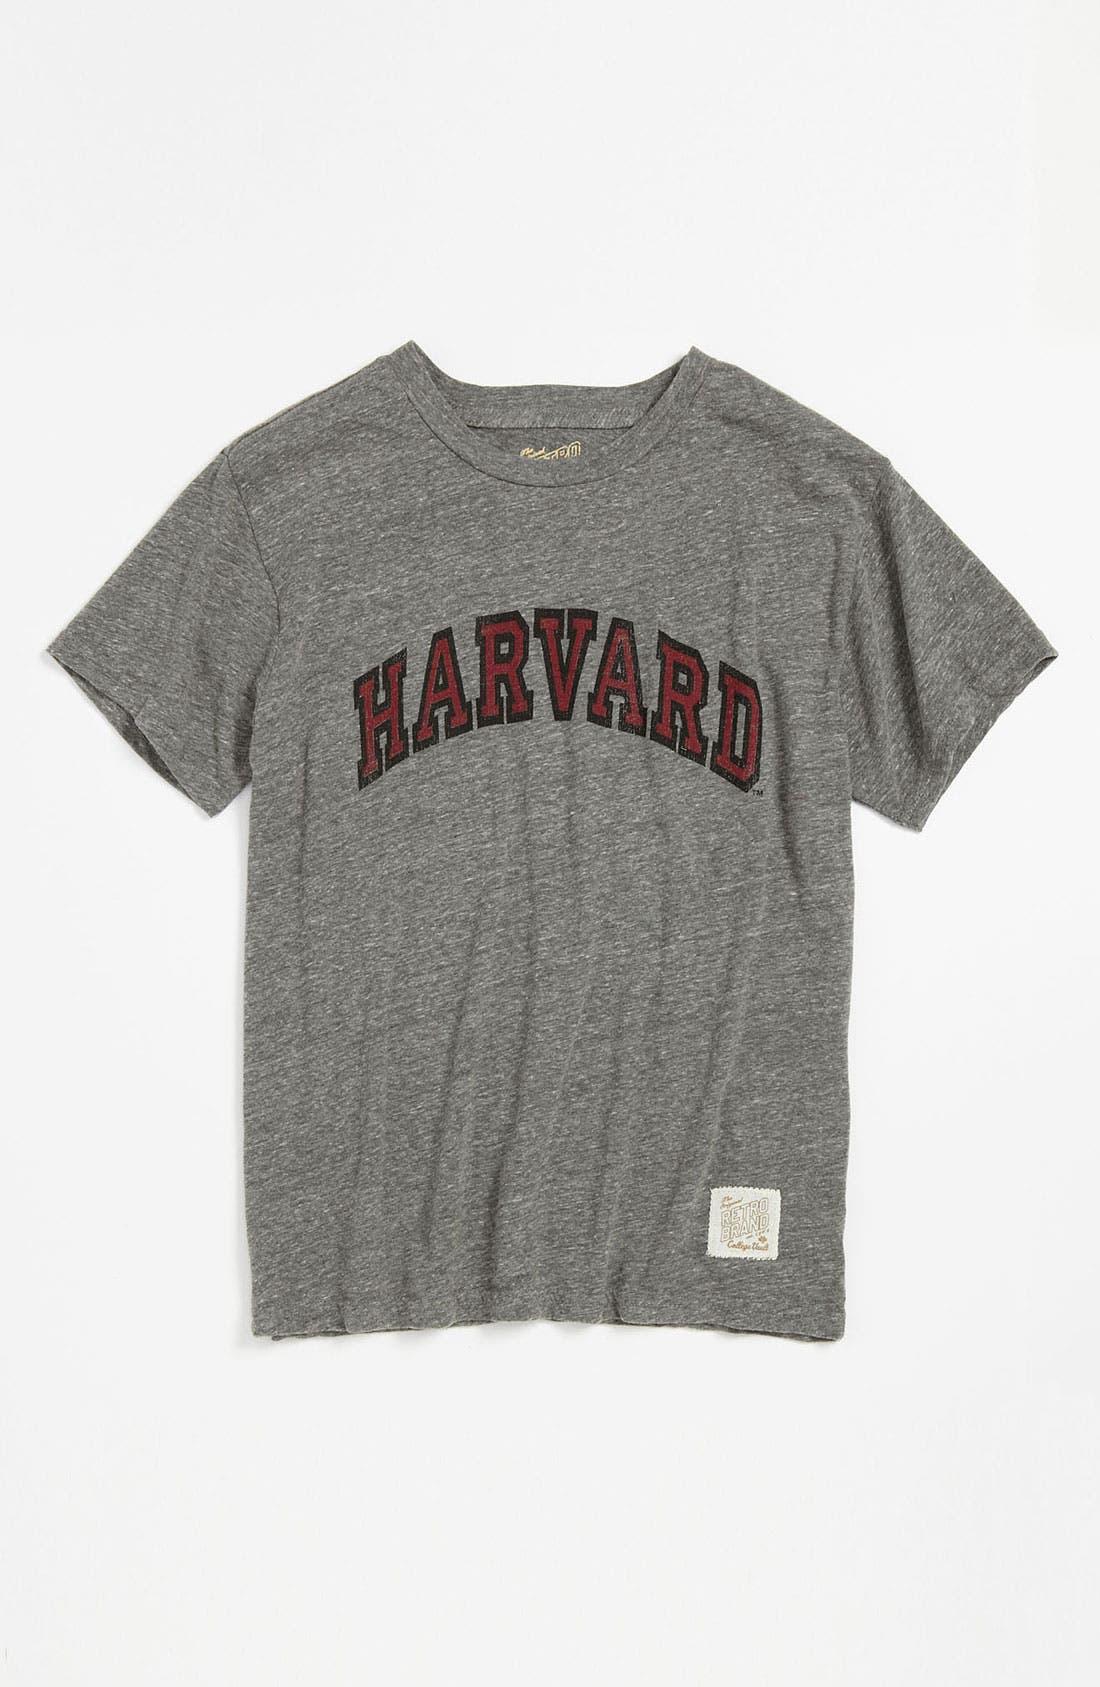 Alternate Image 1 Selected - Retro Brand 'Harvard' T-Shirt (Big Boys)